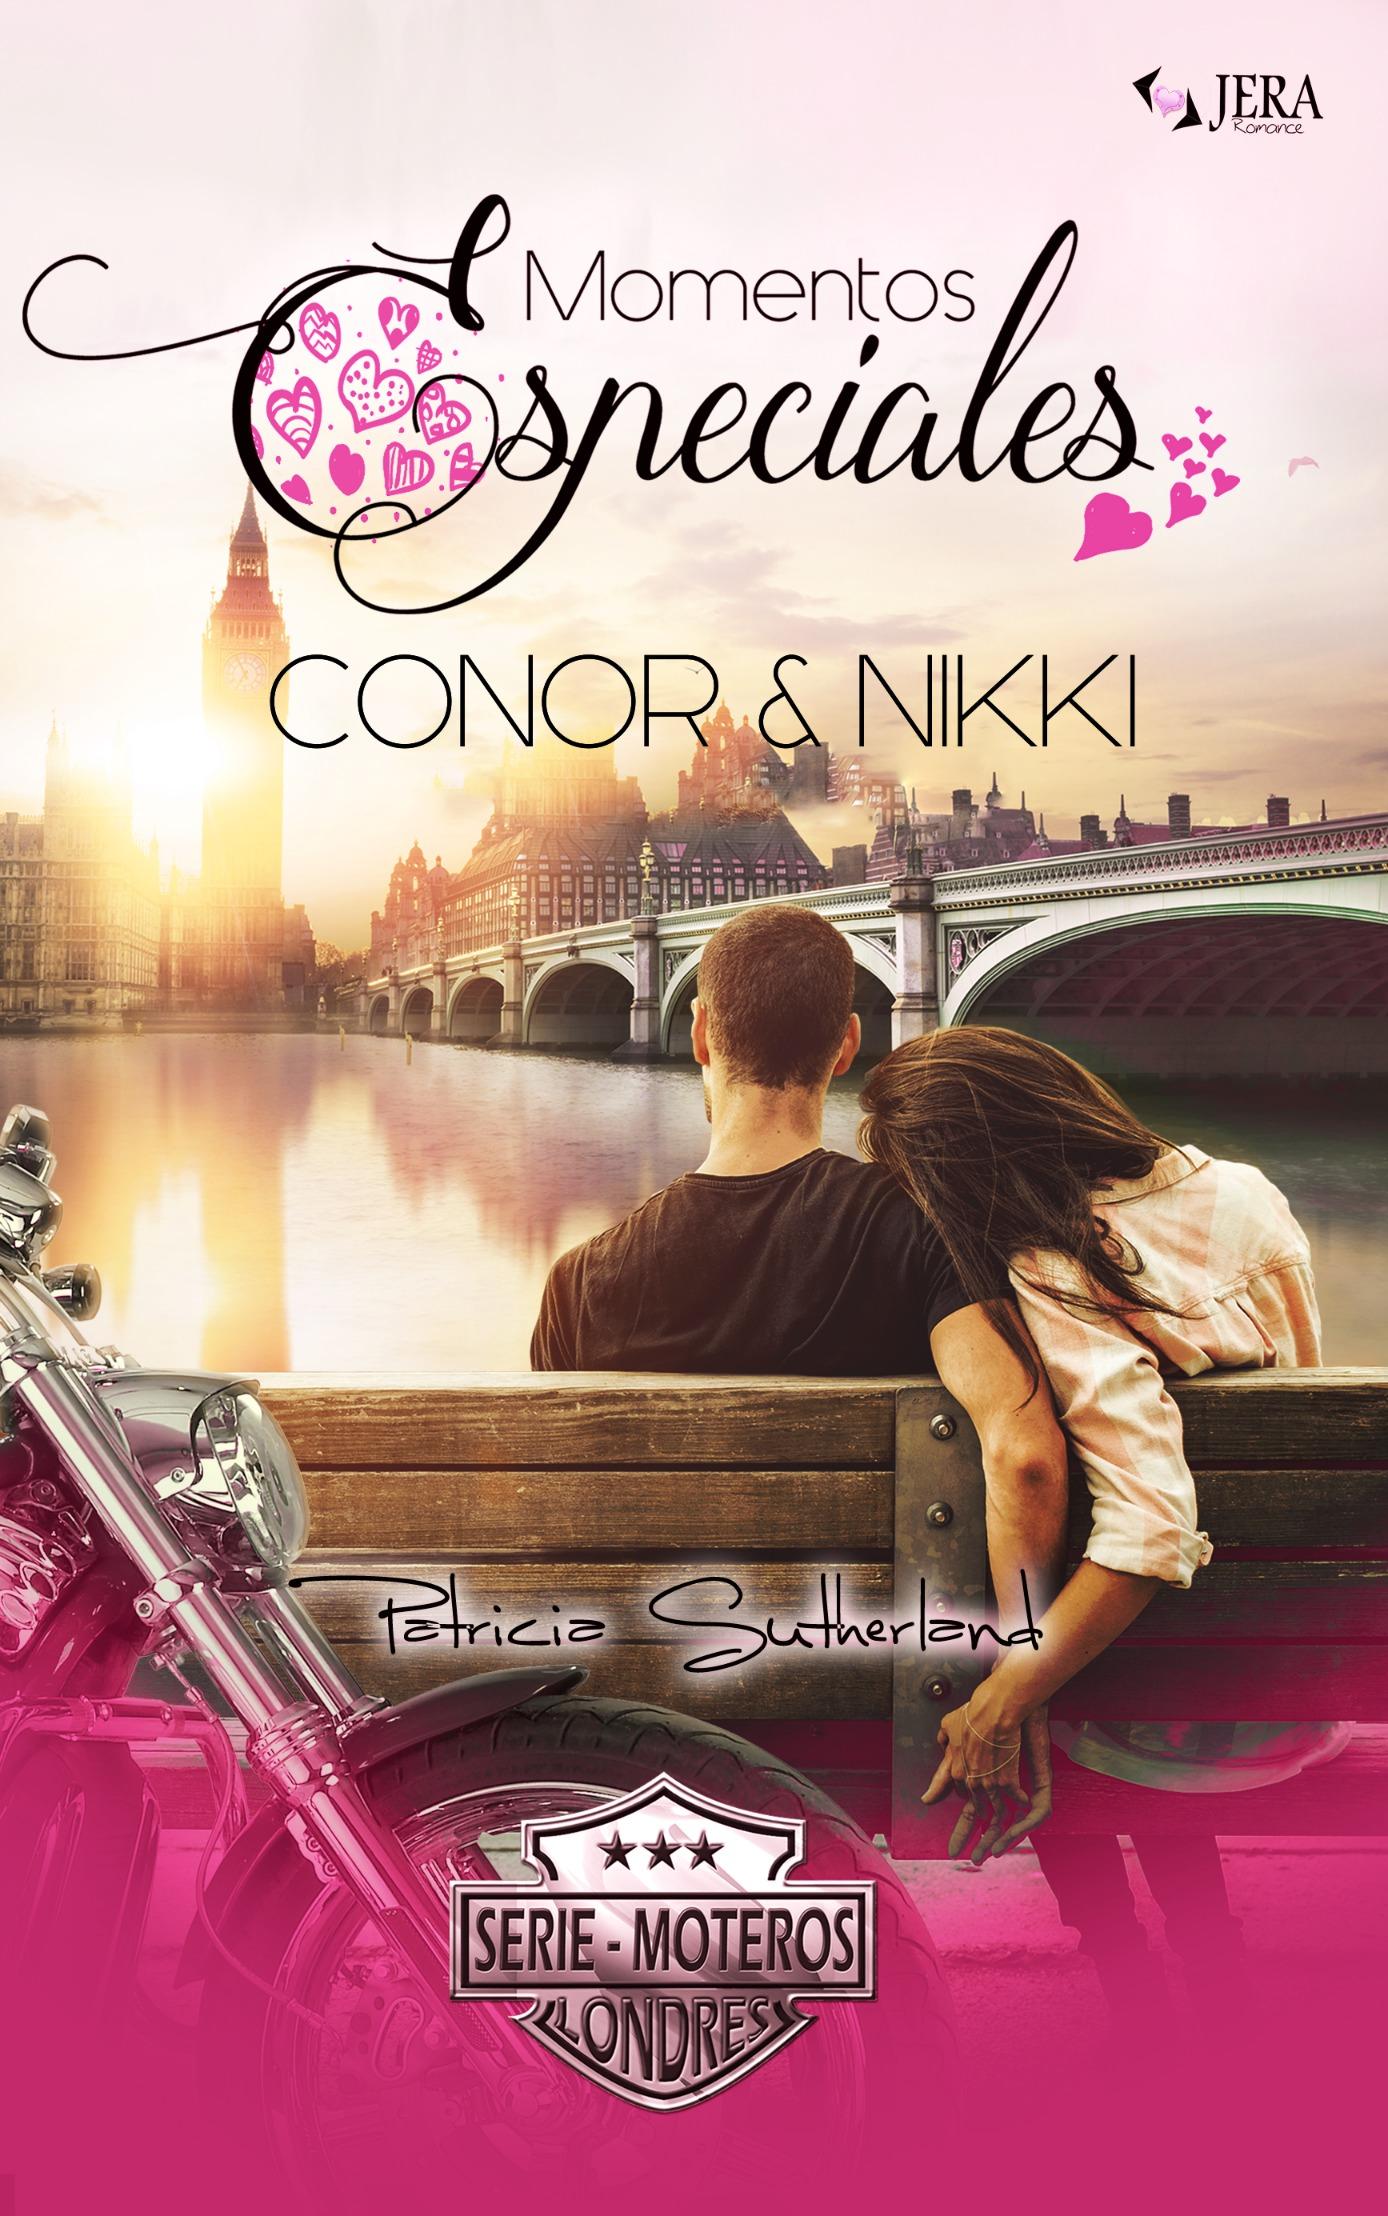 Momentos Especiales - Conor & Nikki. Extras Serie Moteros  # 9